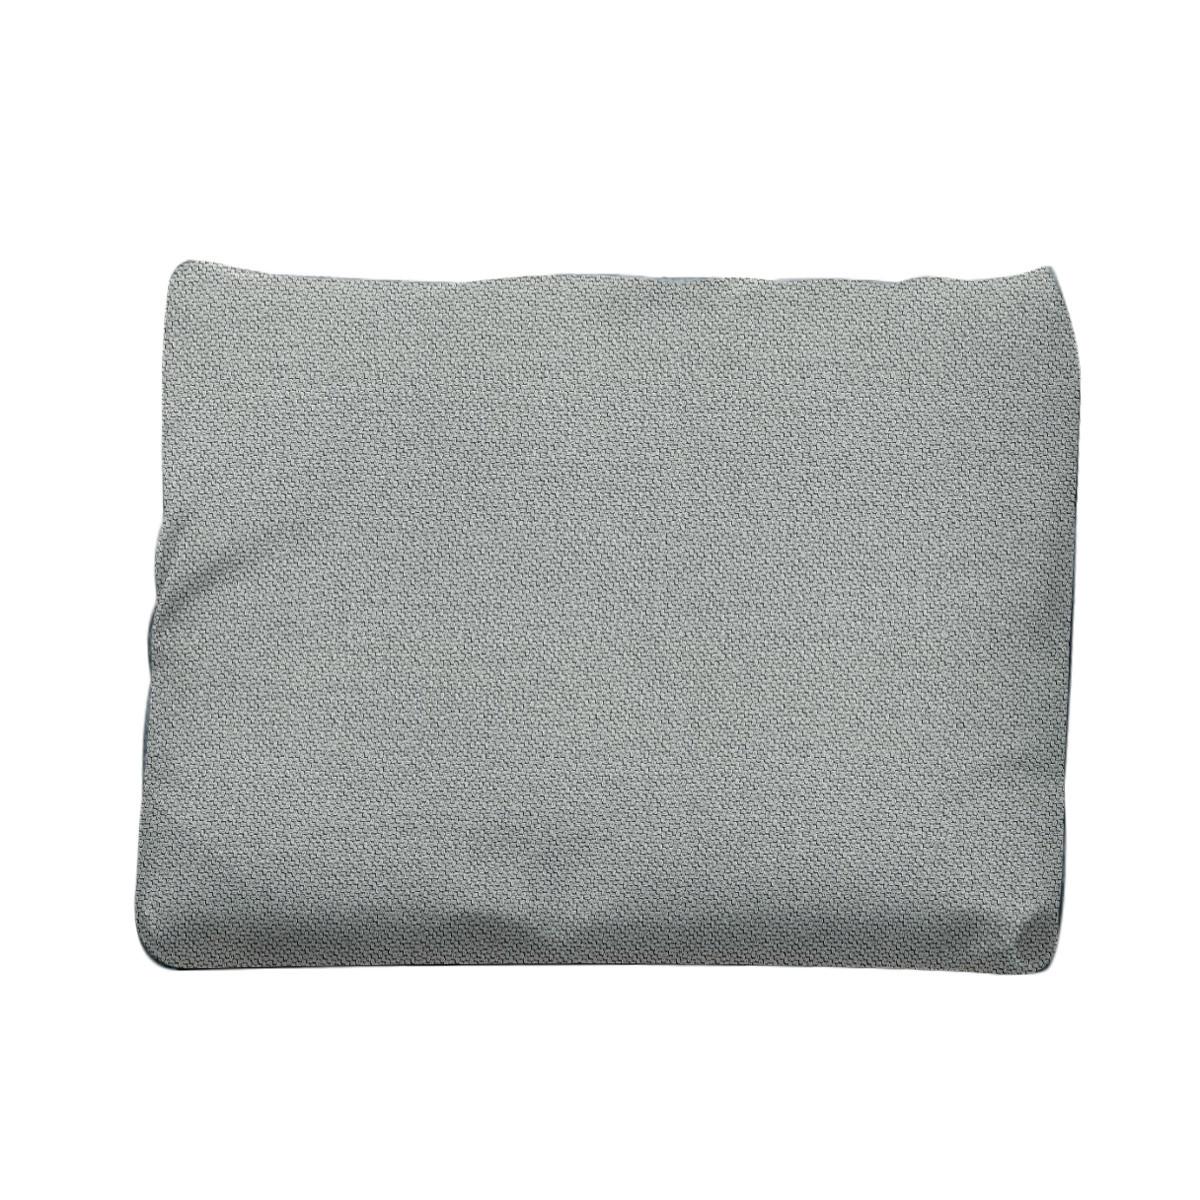 Hay Kissen hay kissen mags cushion 9 hallingdal 130 grau t 9 h 48 b 55